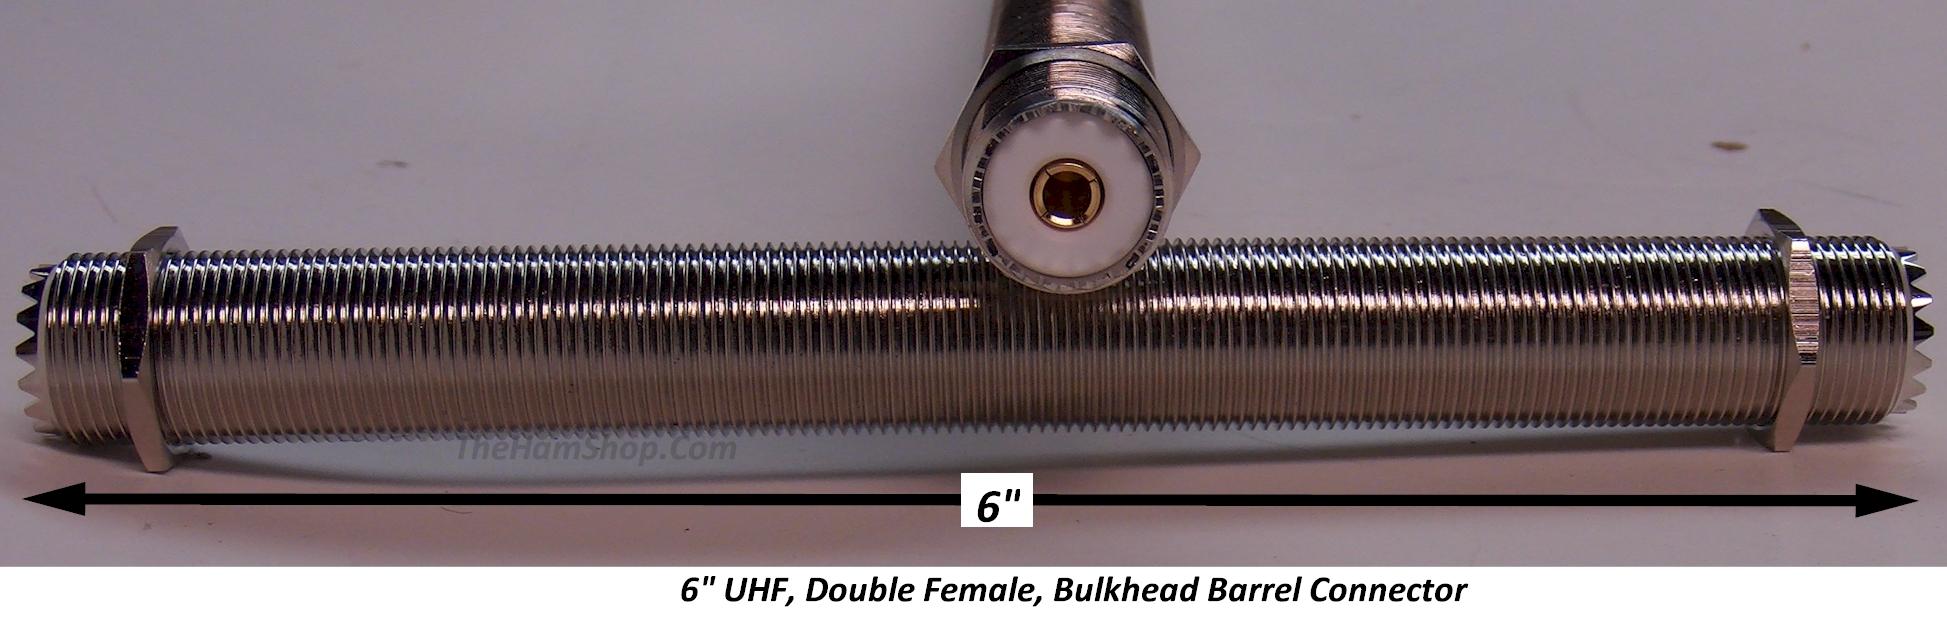 Uhf double so female bulkhead barrel connector quot long